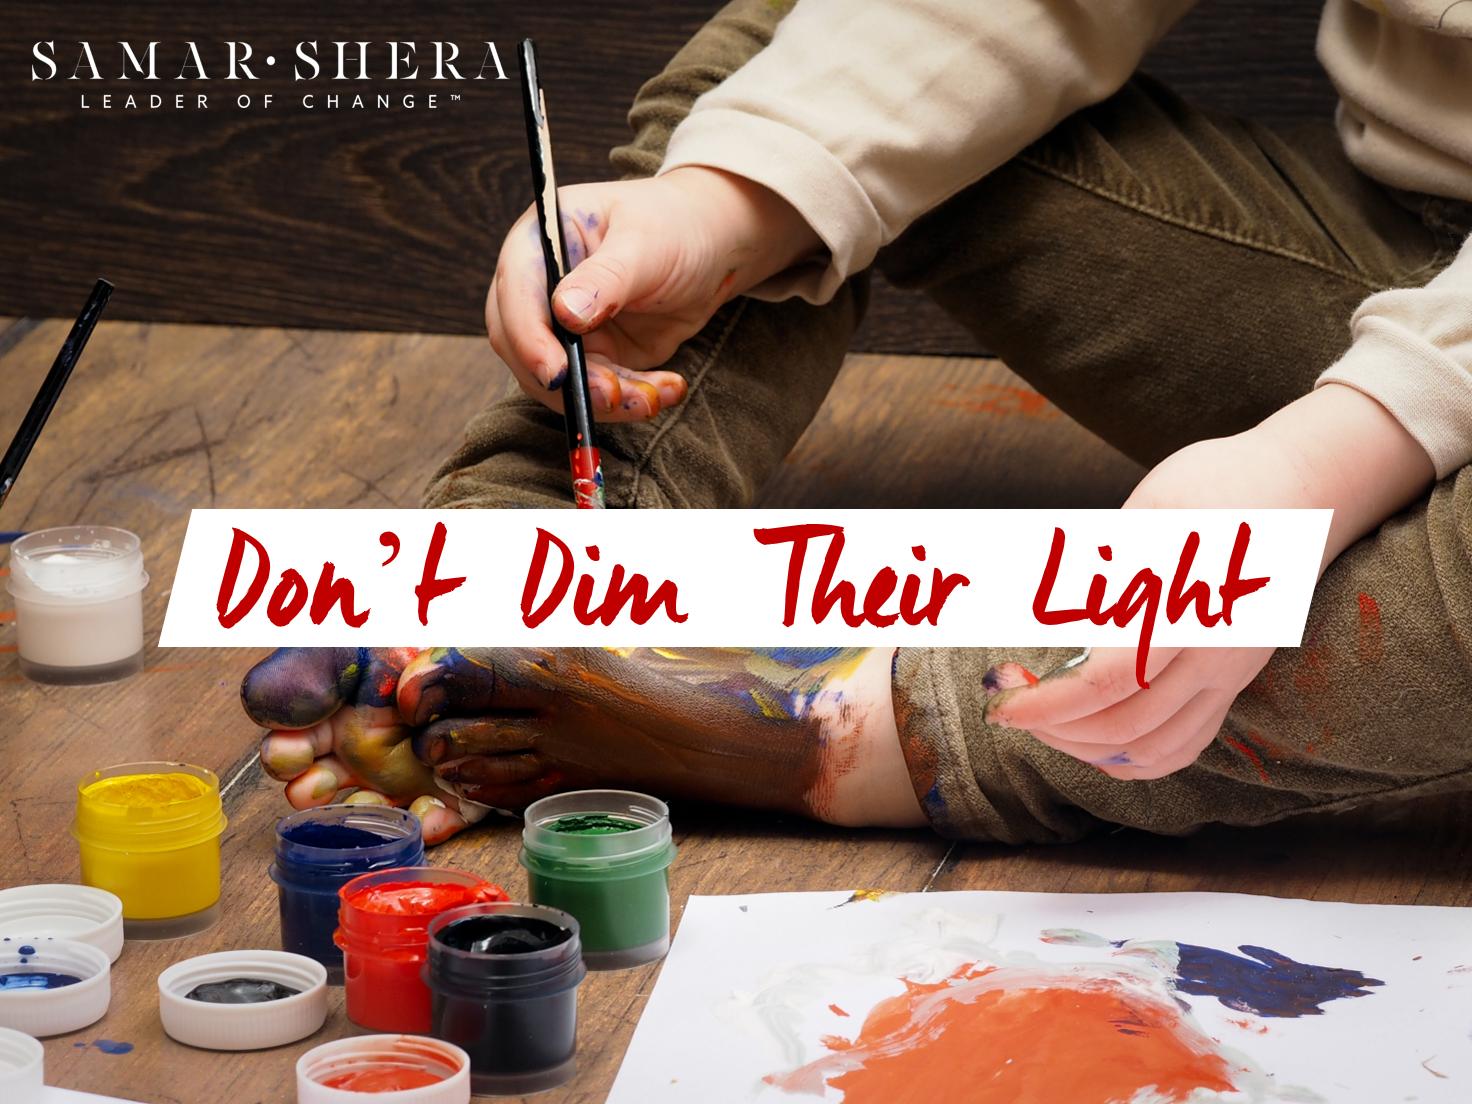 don't dim their light